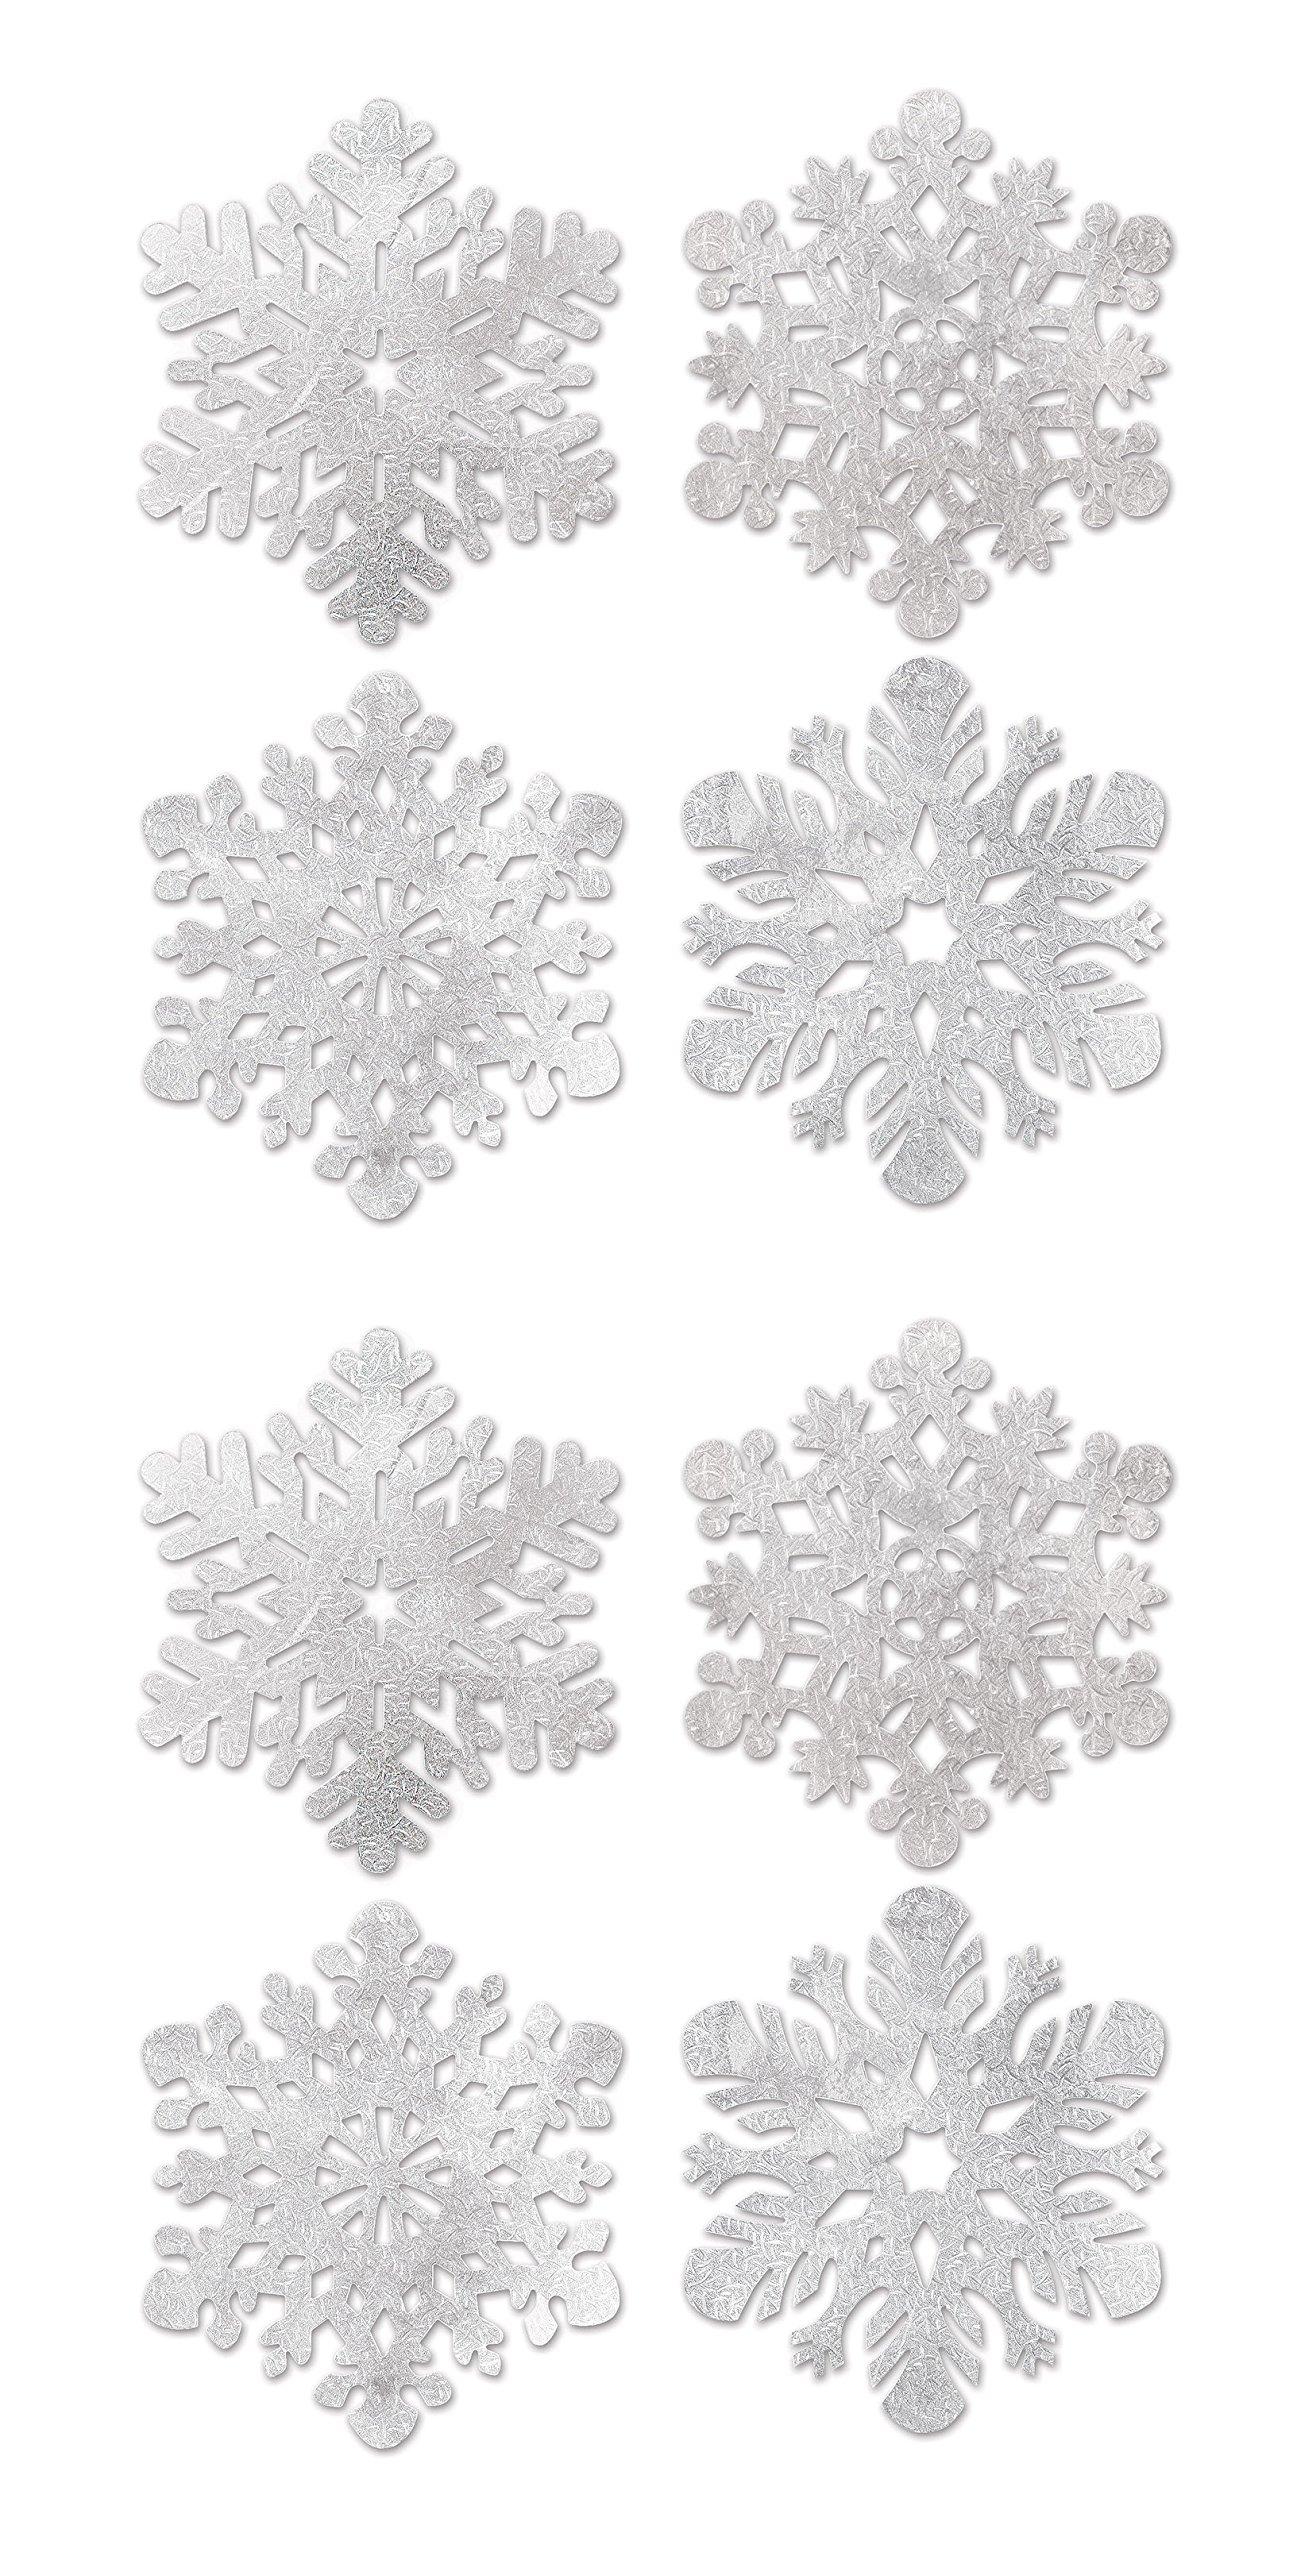 Beistle S22932AZ2, 8 Piece Foil Snowflake Cutouts, 14'' (Silver) by Beistle